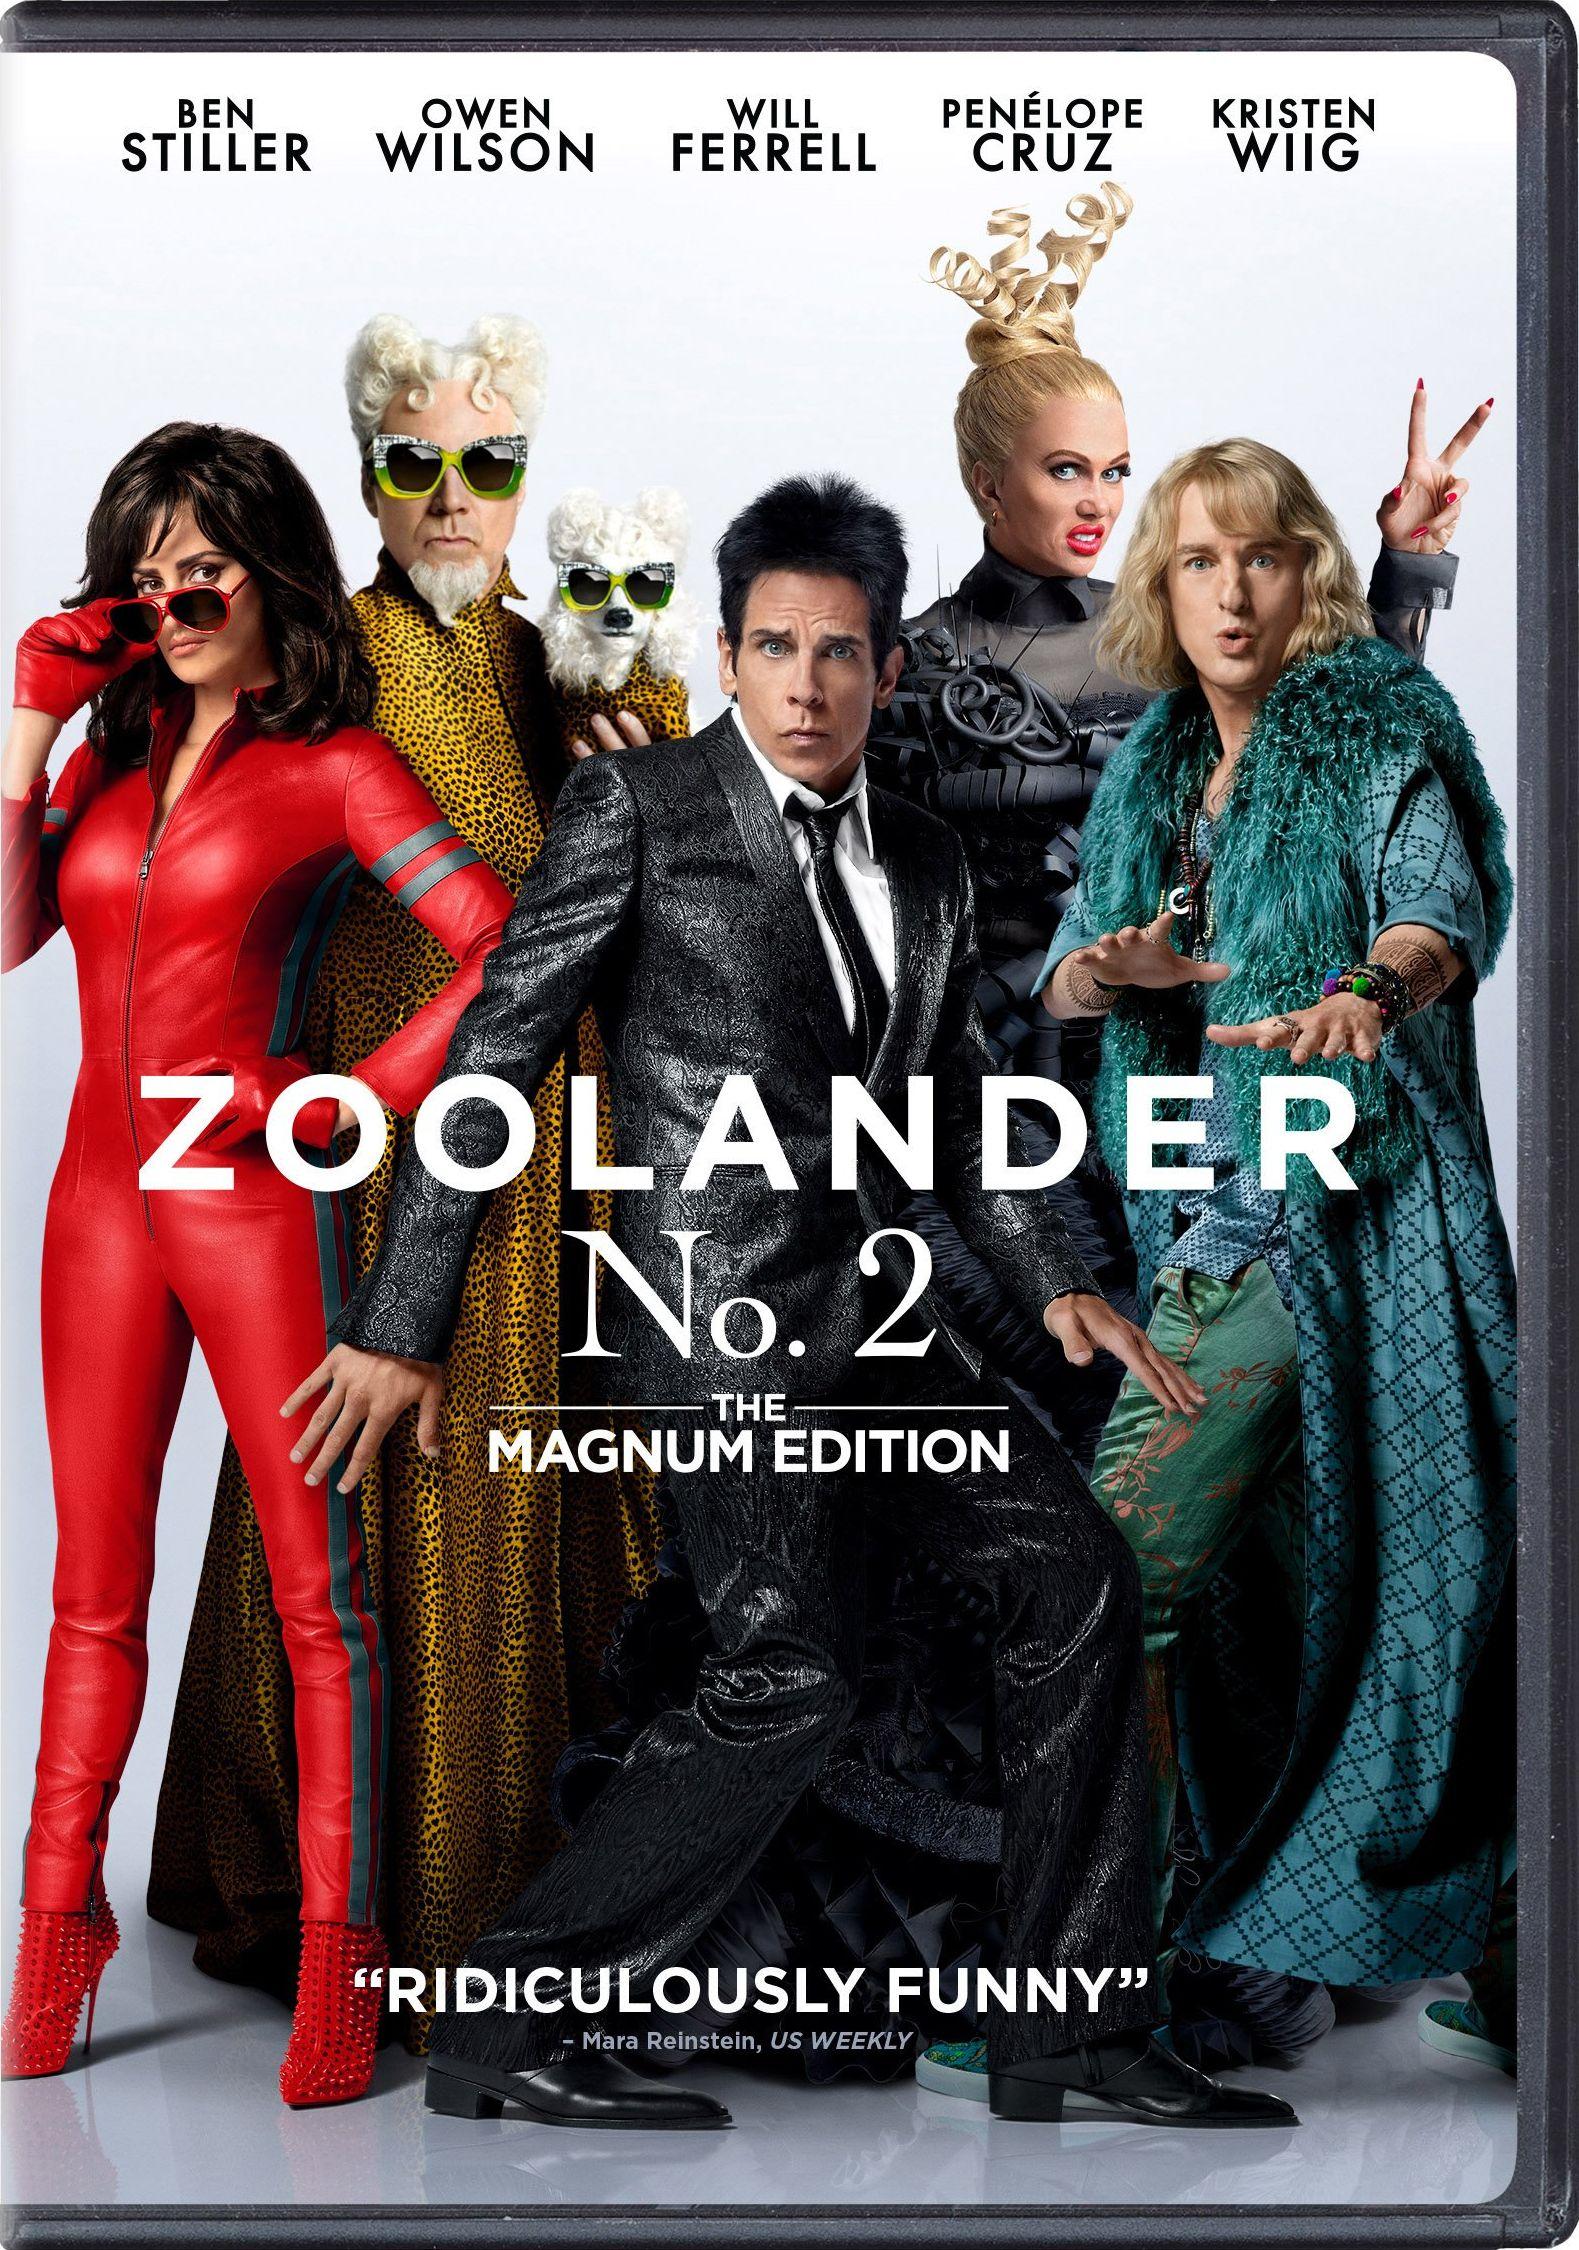 Zoolander 2 clipart free library Zoolander 2 DVD Release Date May 24, 2016 clipart free library